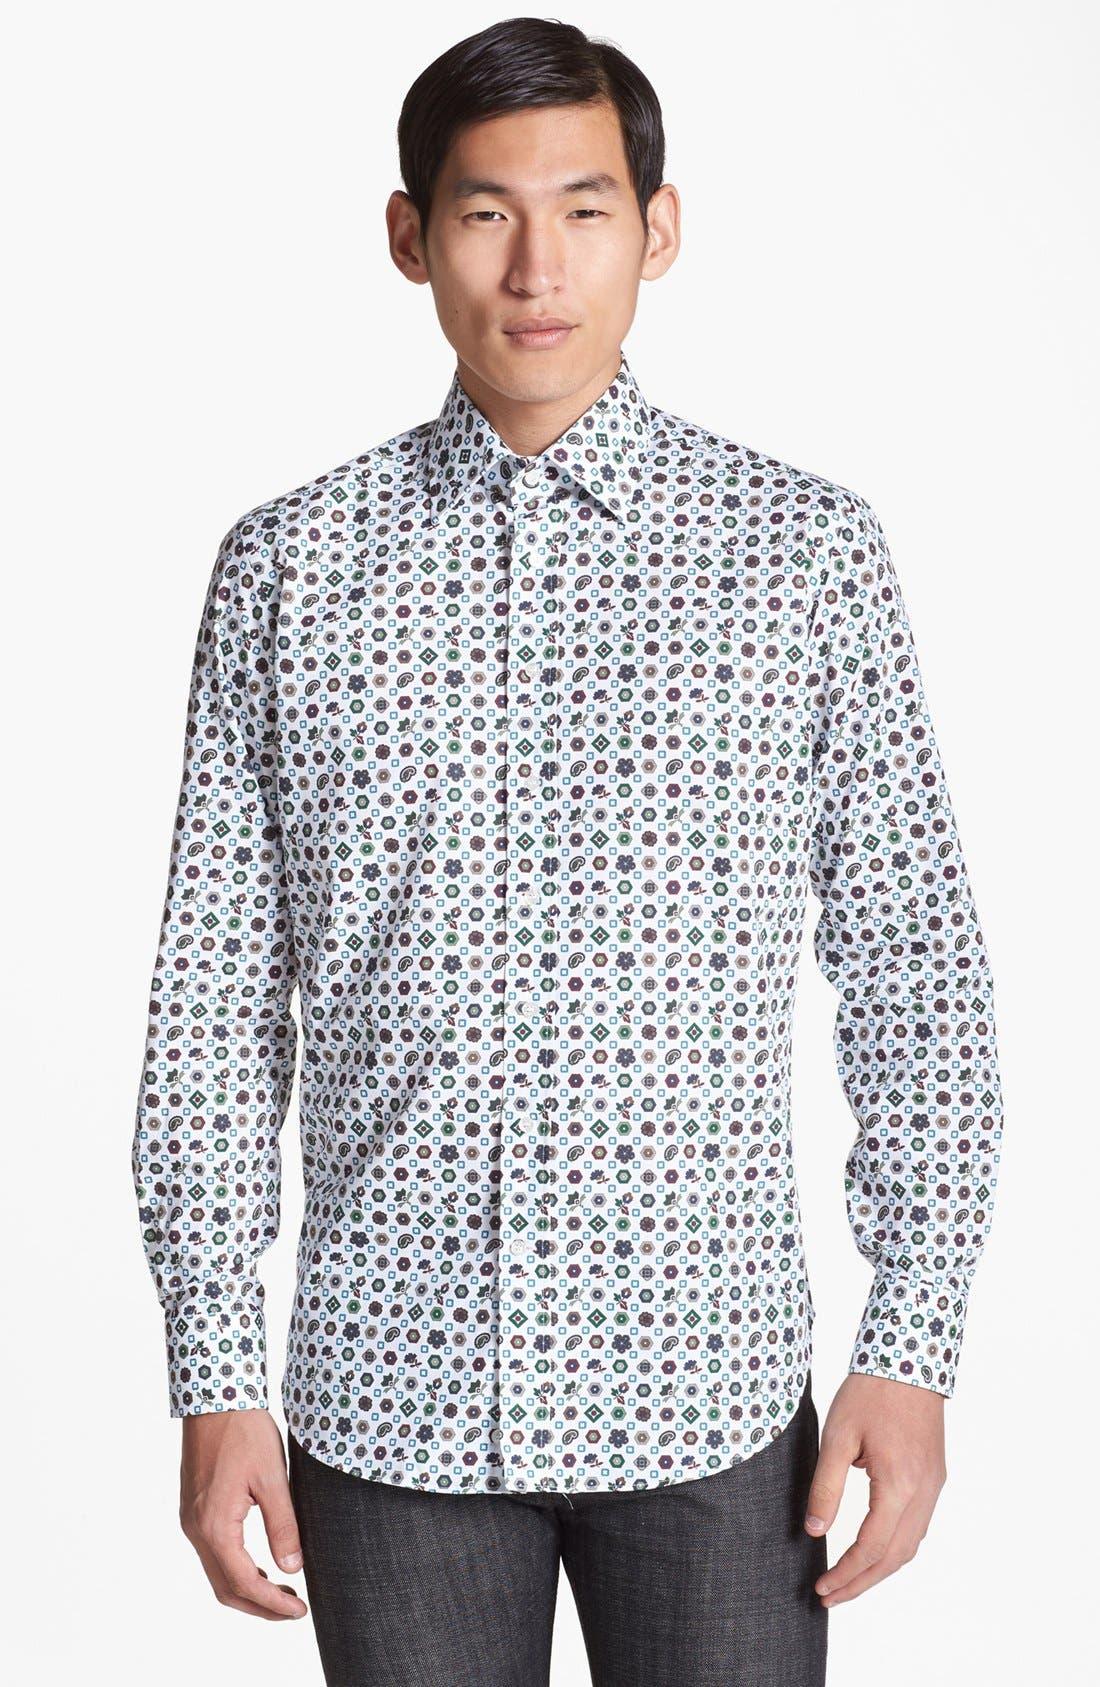 Alternate Image 1 Selected - Etro Geometric Medallion Print Cotton Shirt